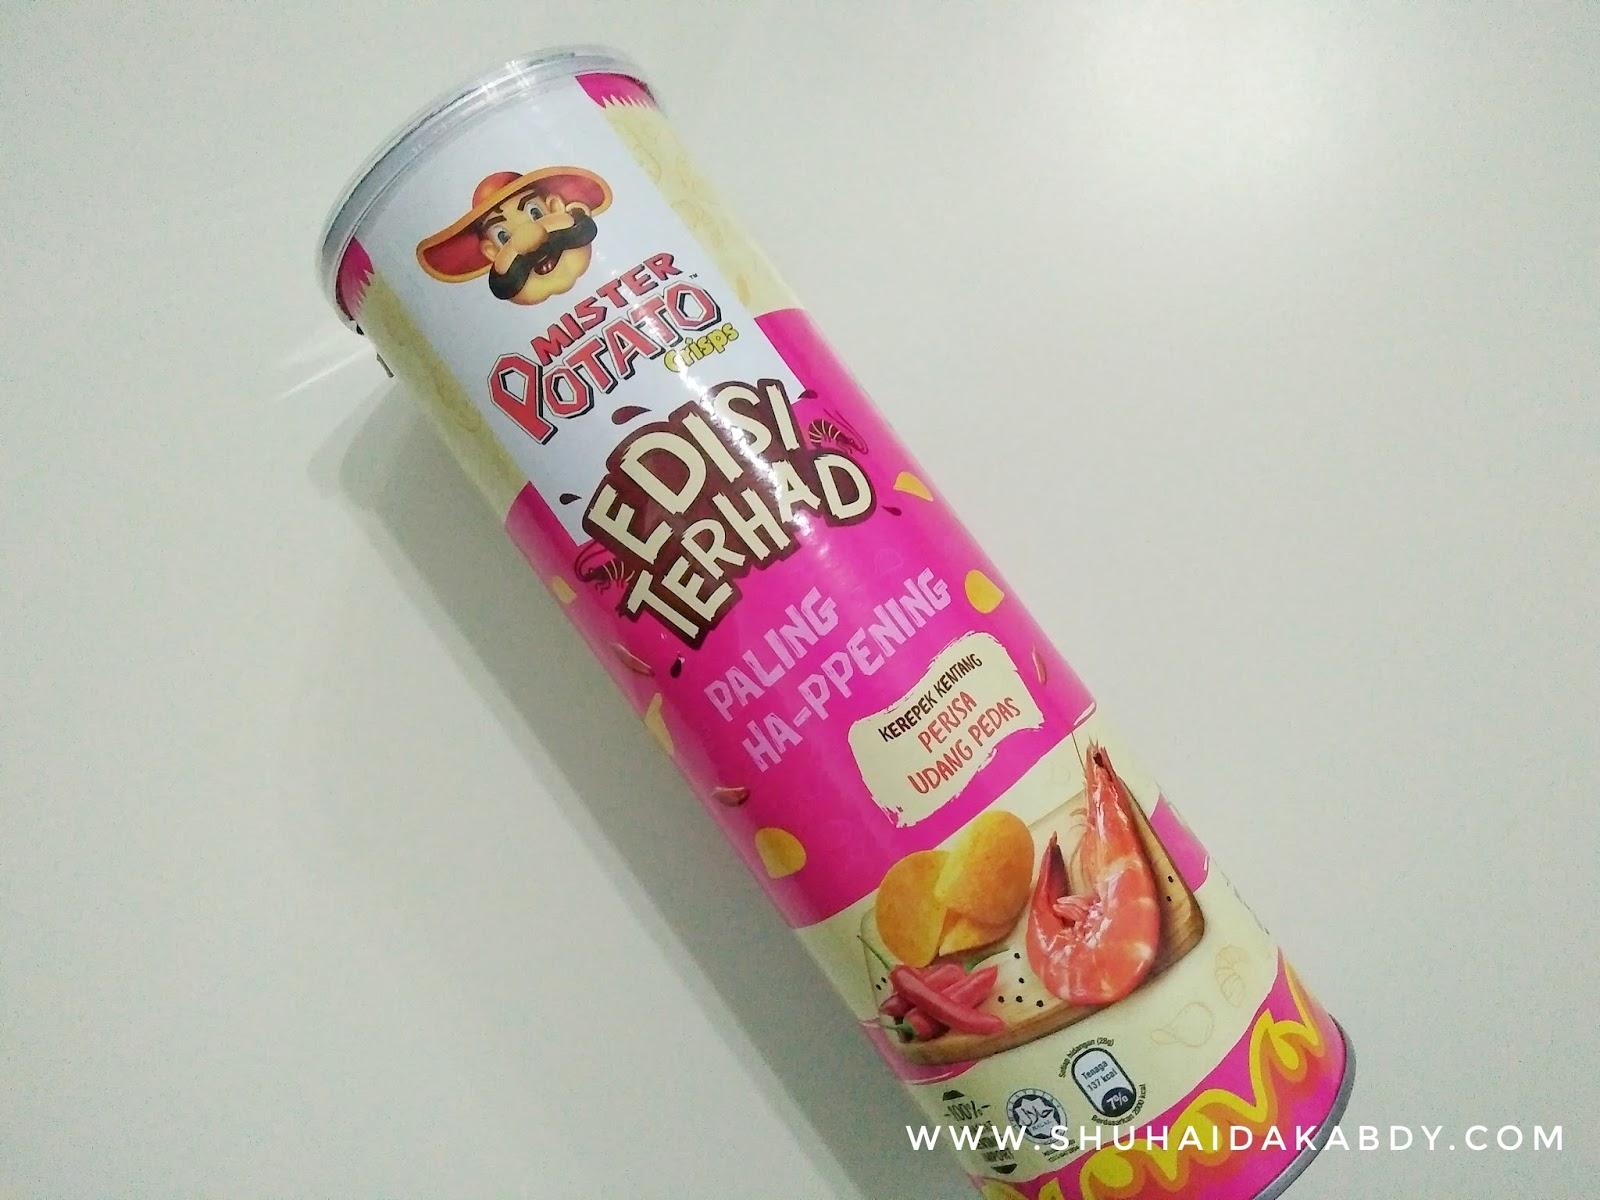 Mister Potato Terbaru Edisi Terhad Udang Pedas